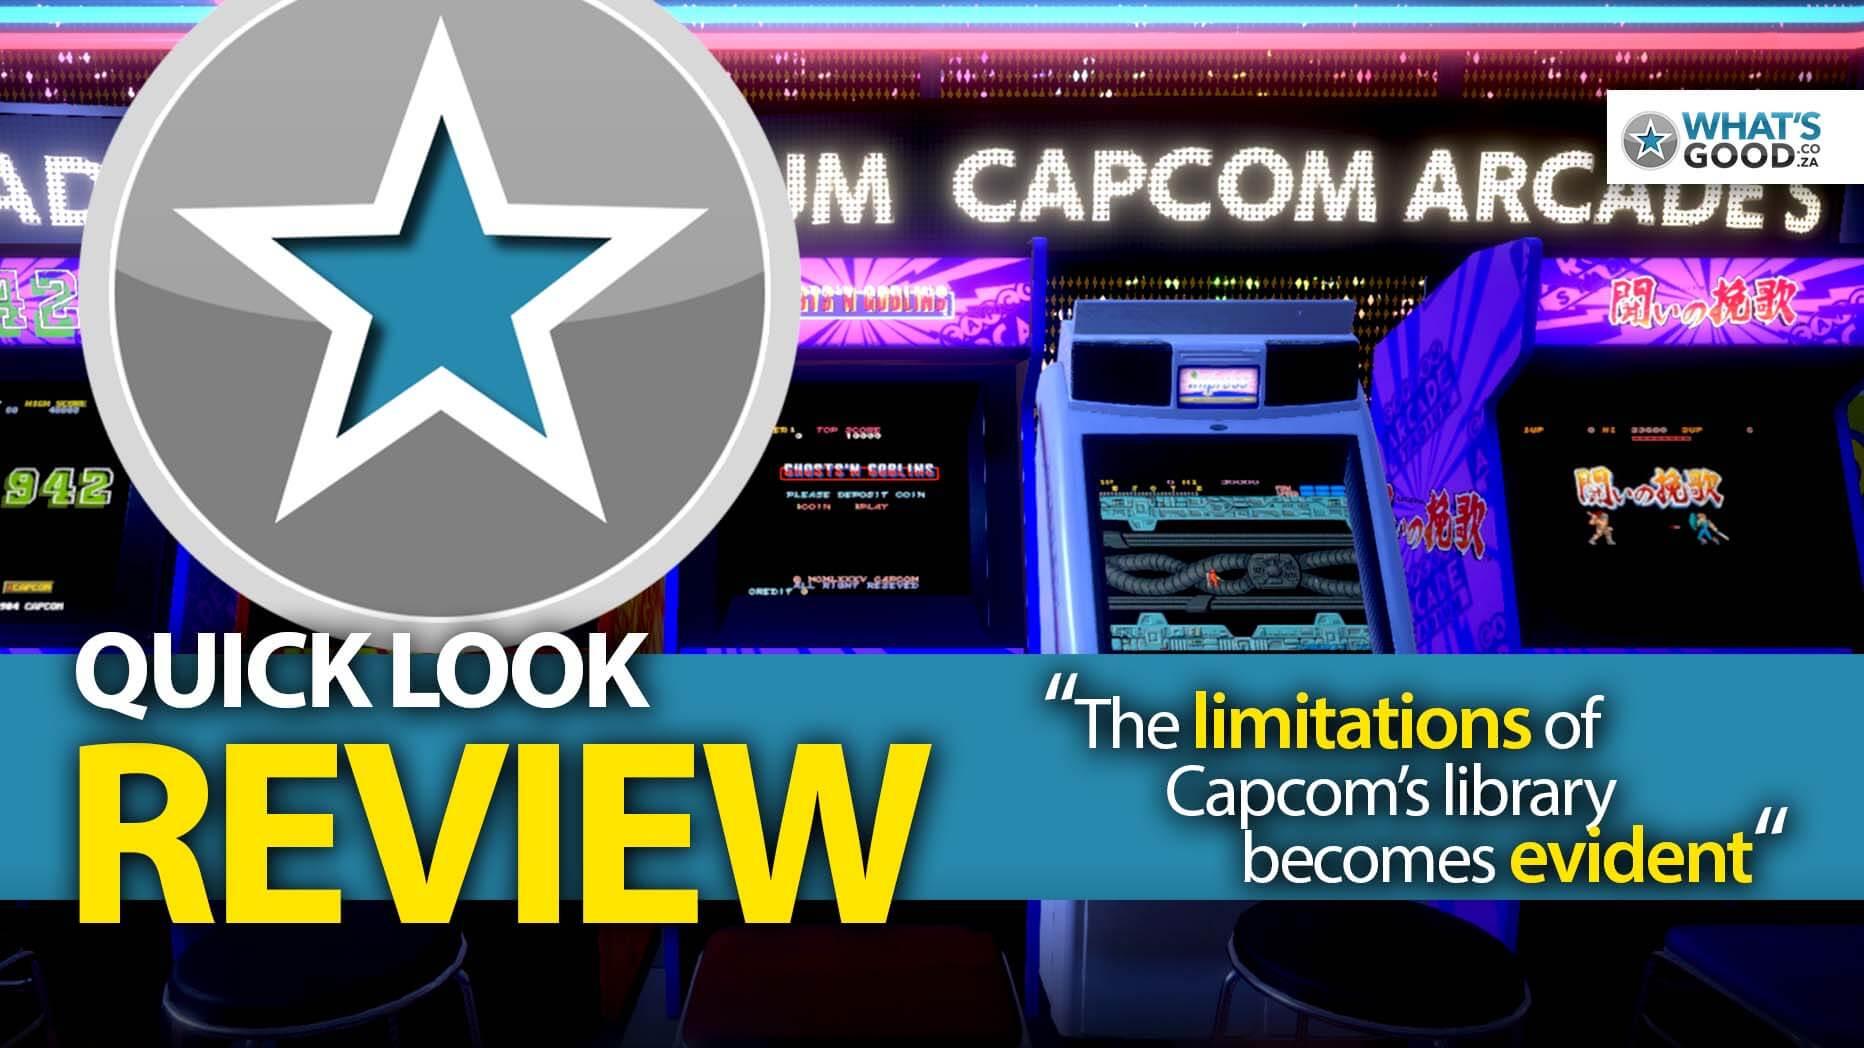 CapcomArcade